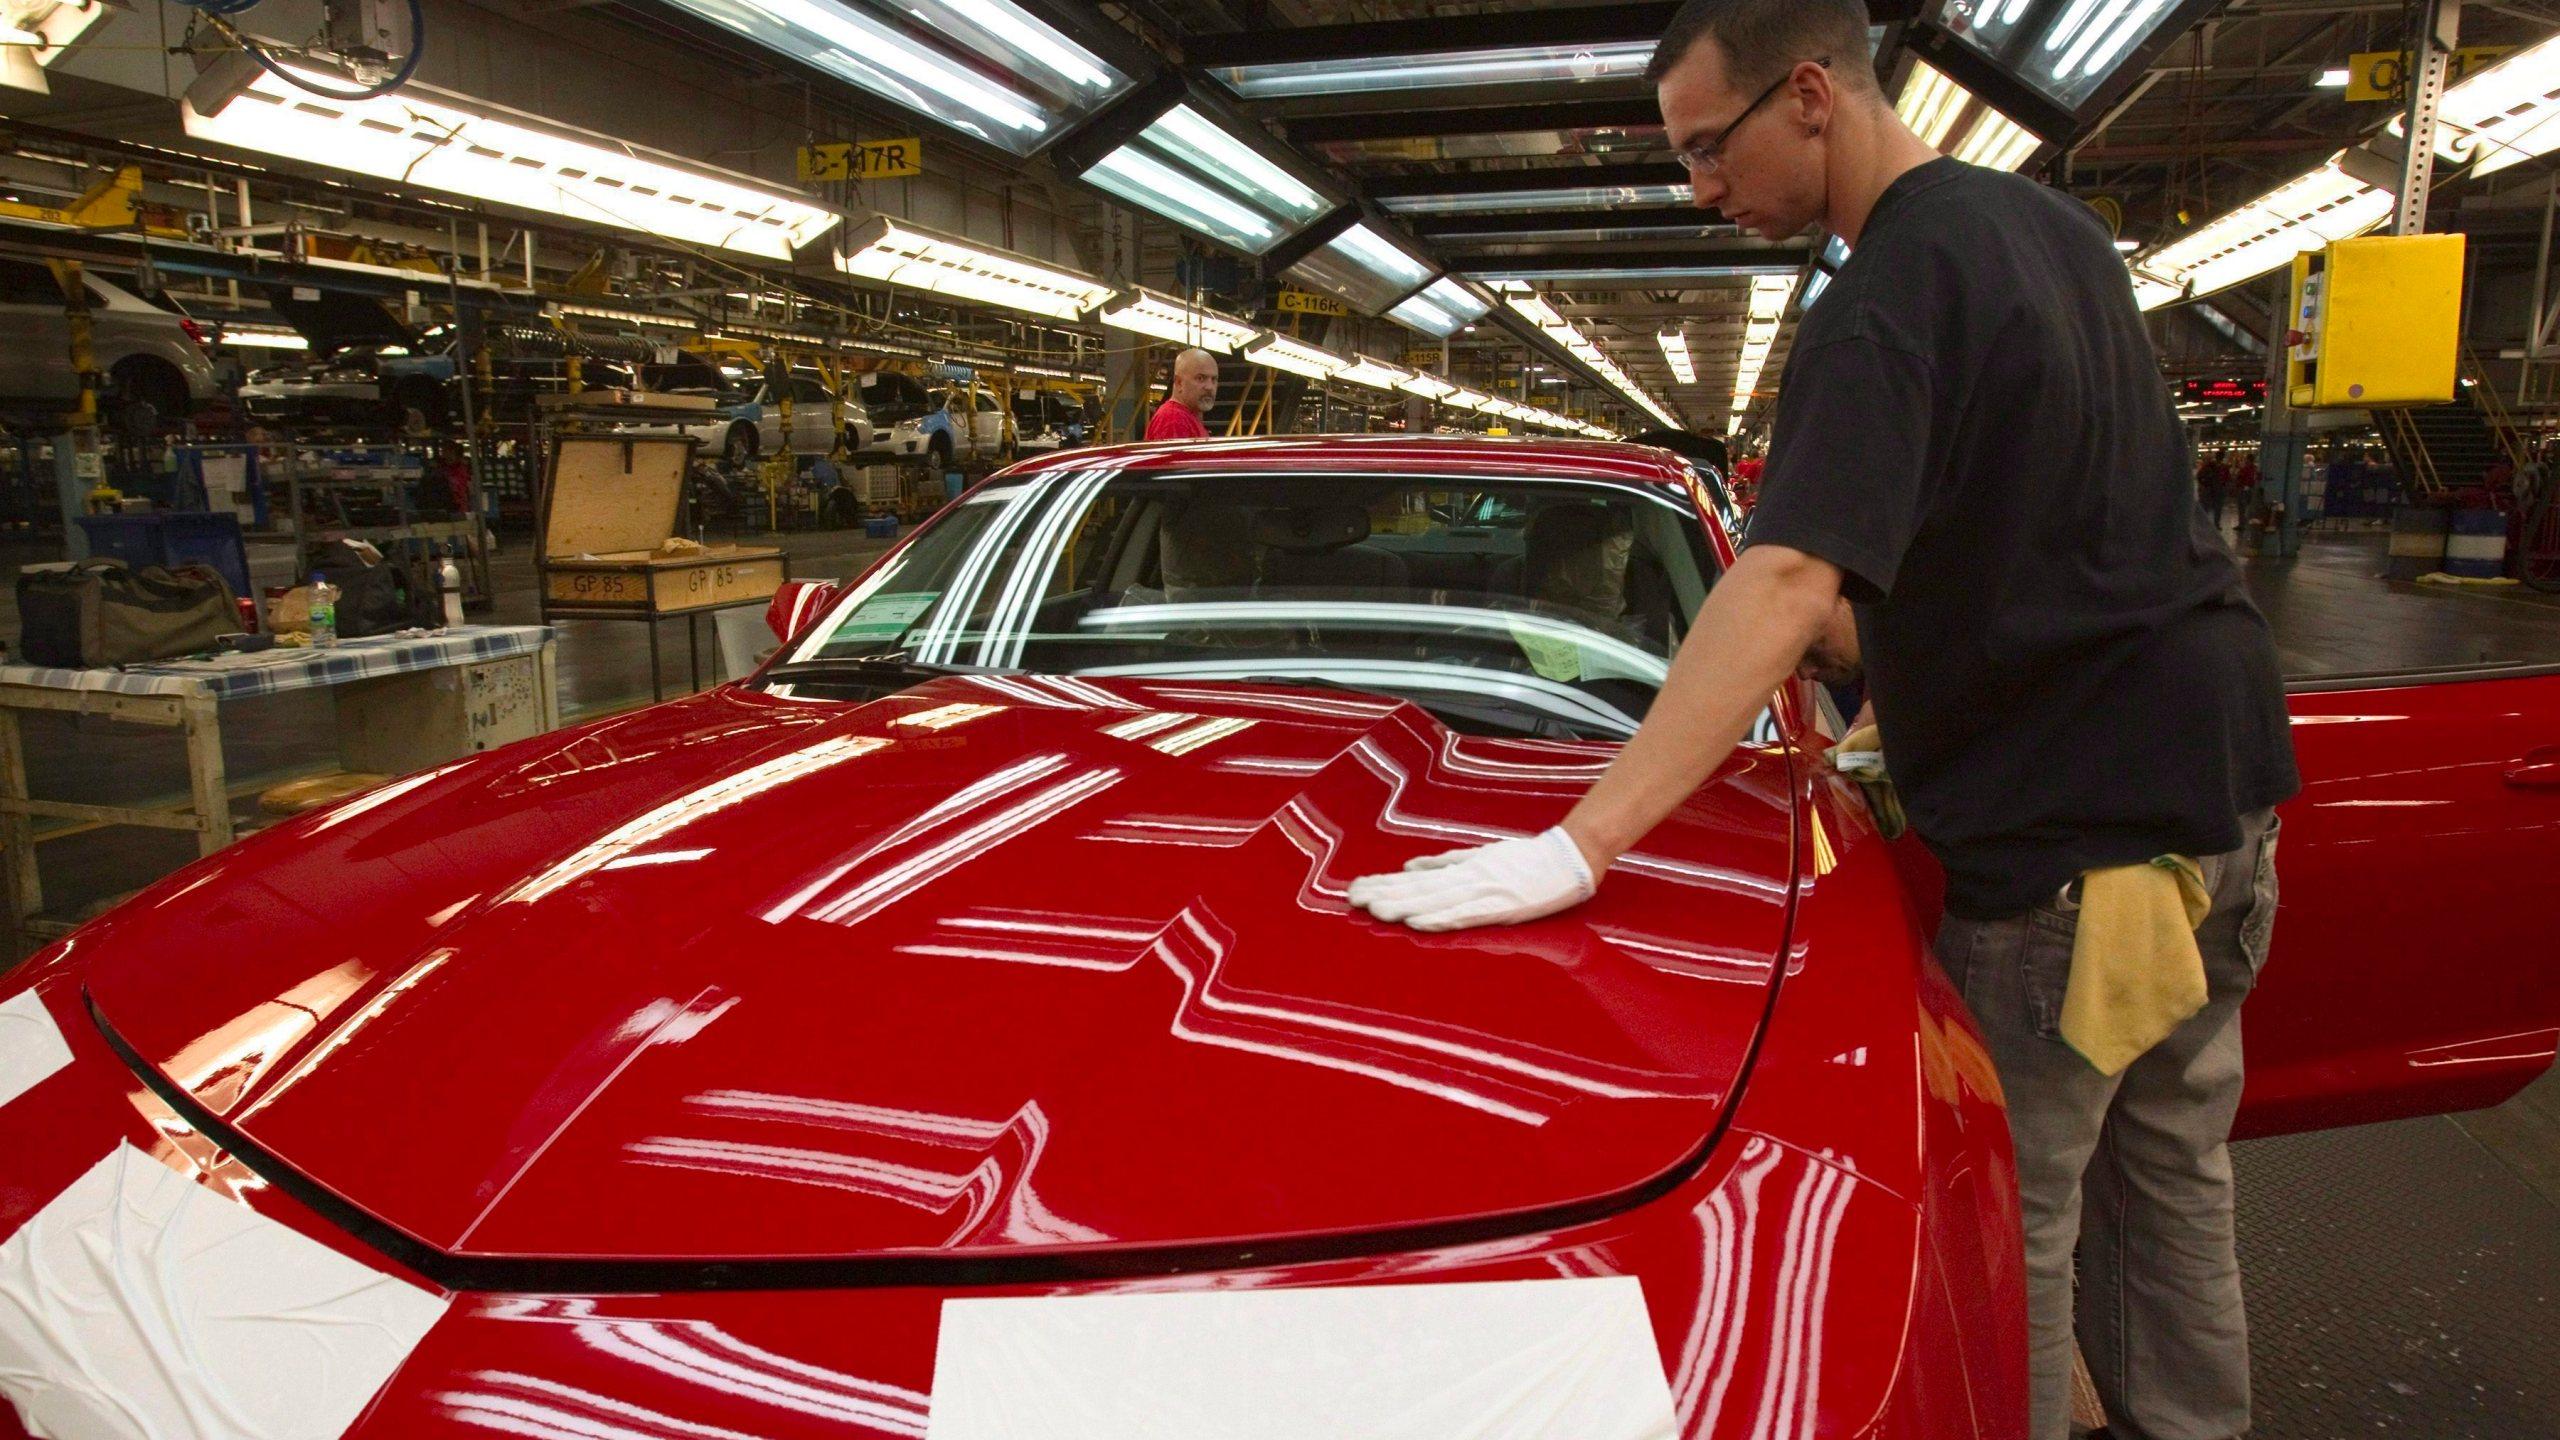 General_Motors_Restructuring_38322-159532.jpg69535187